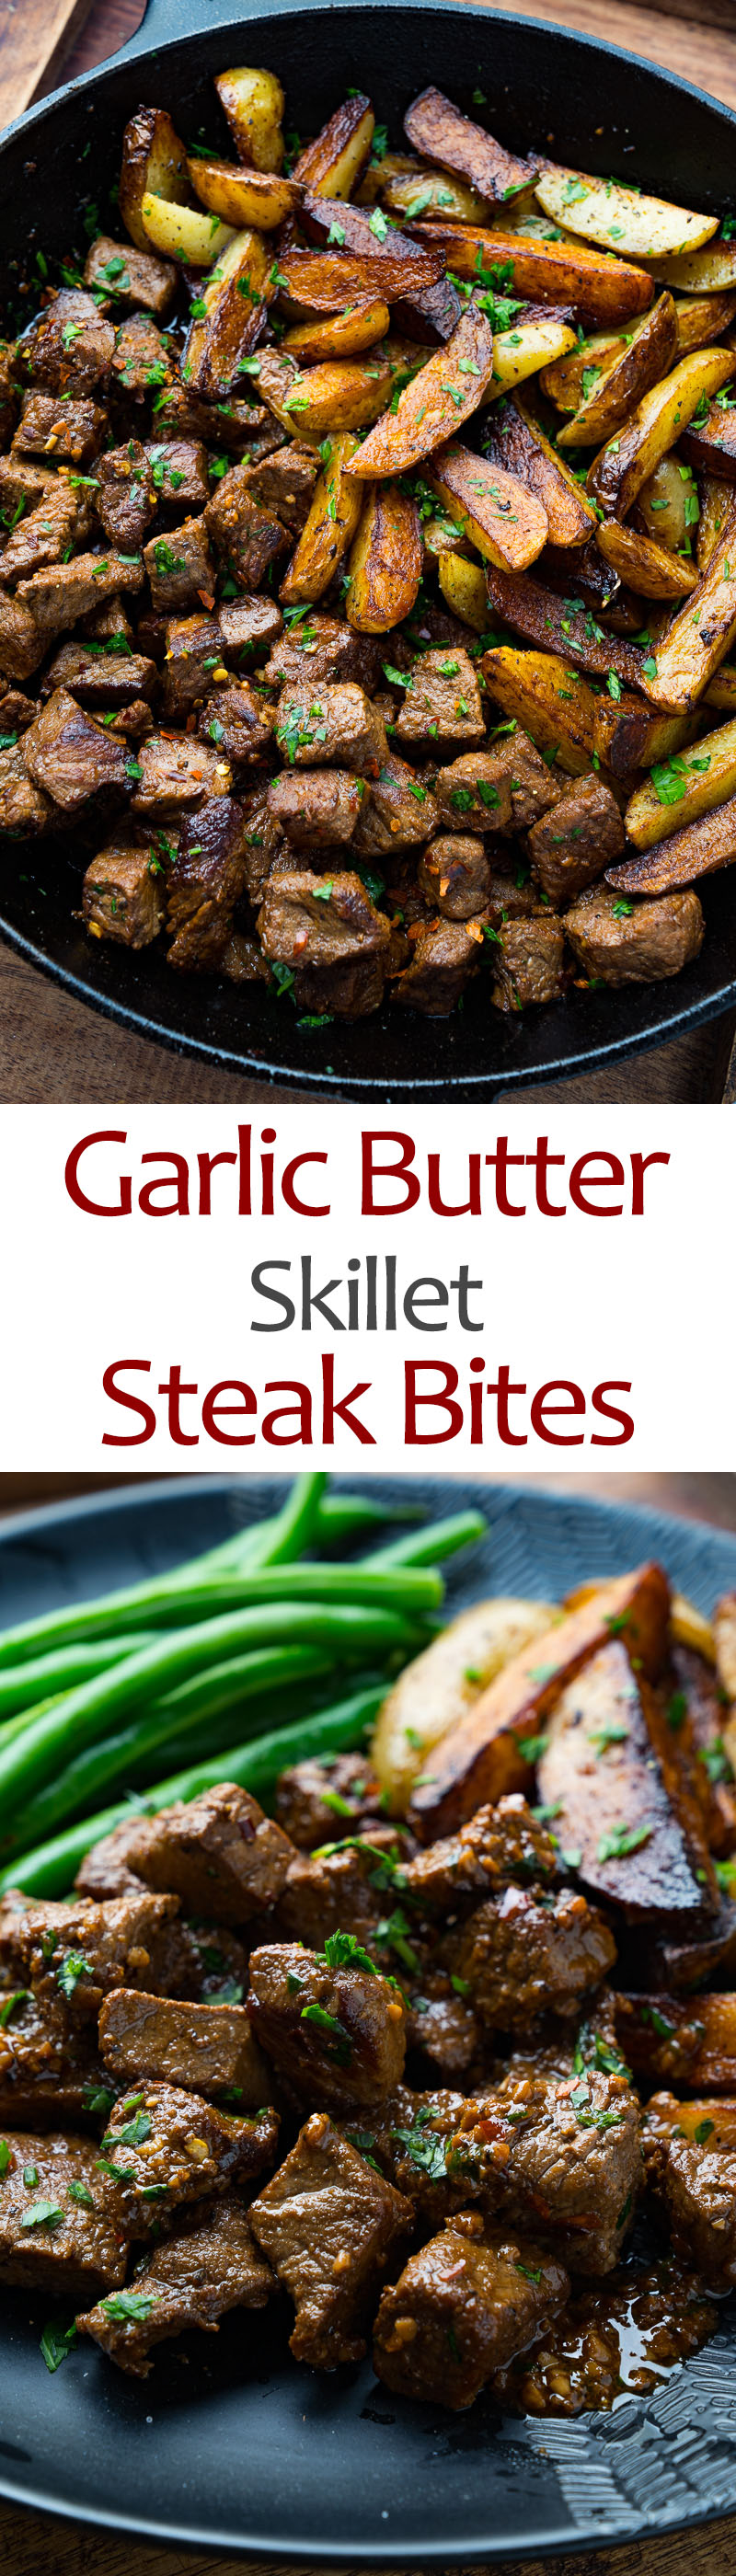 Garlic Butter Skillet Steak Bites and Potatoes